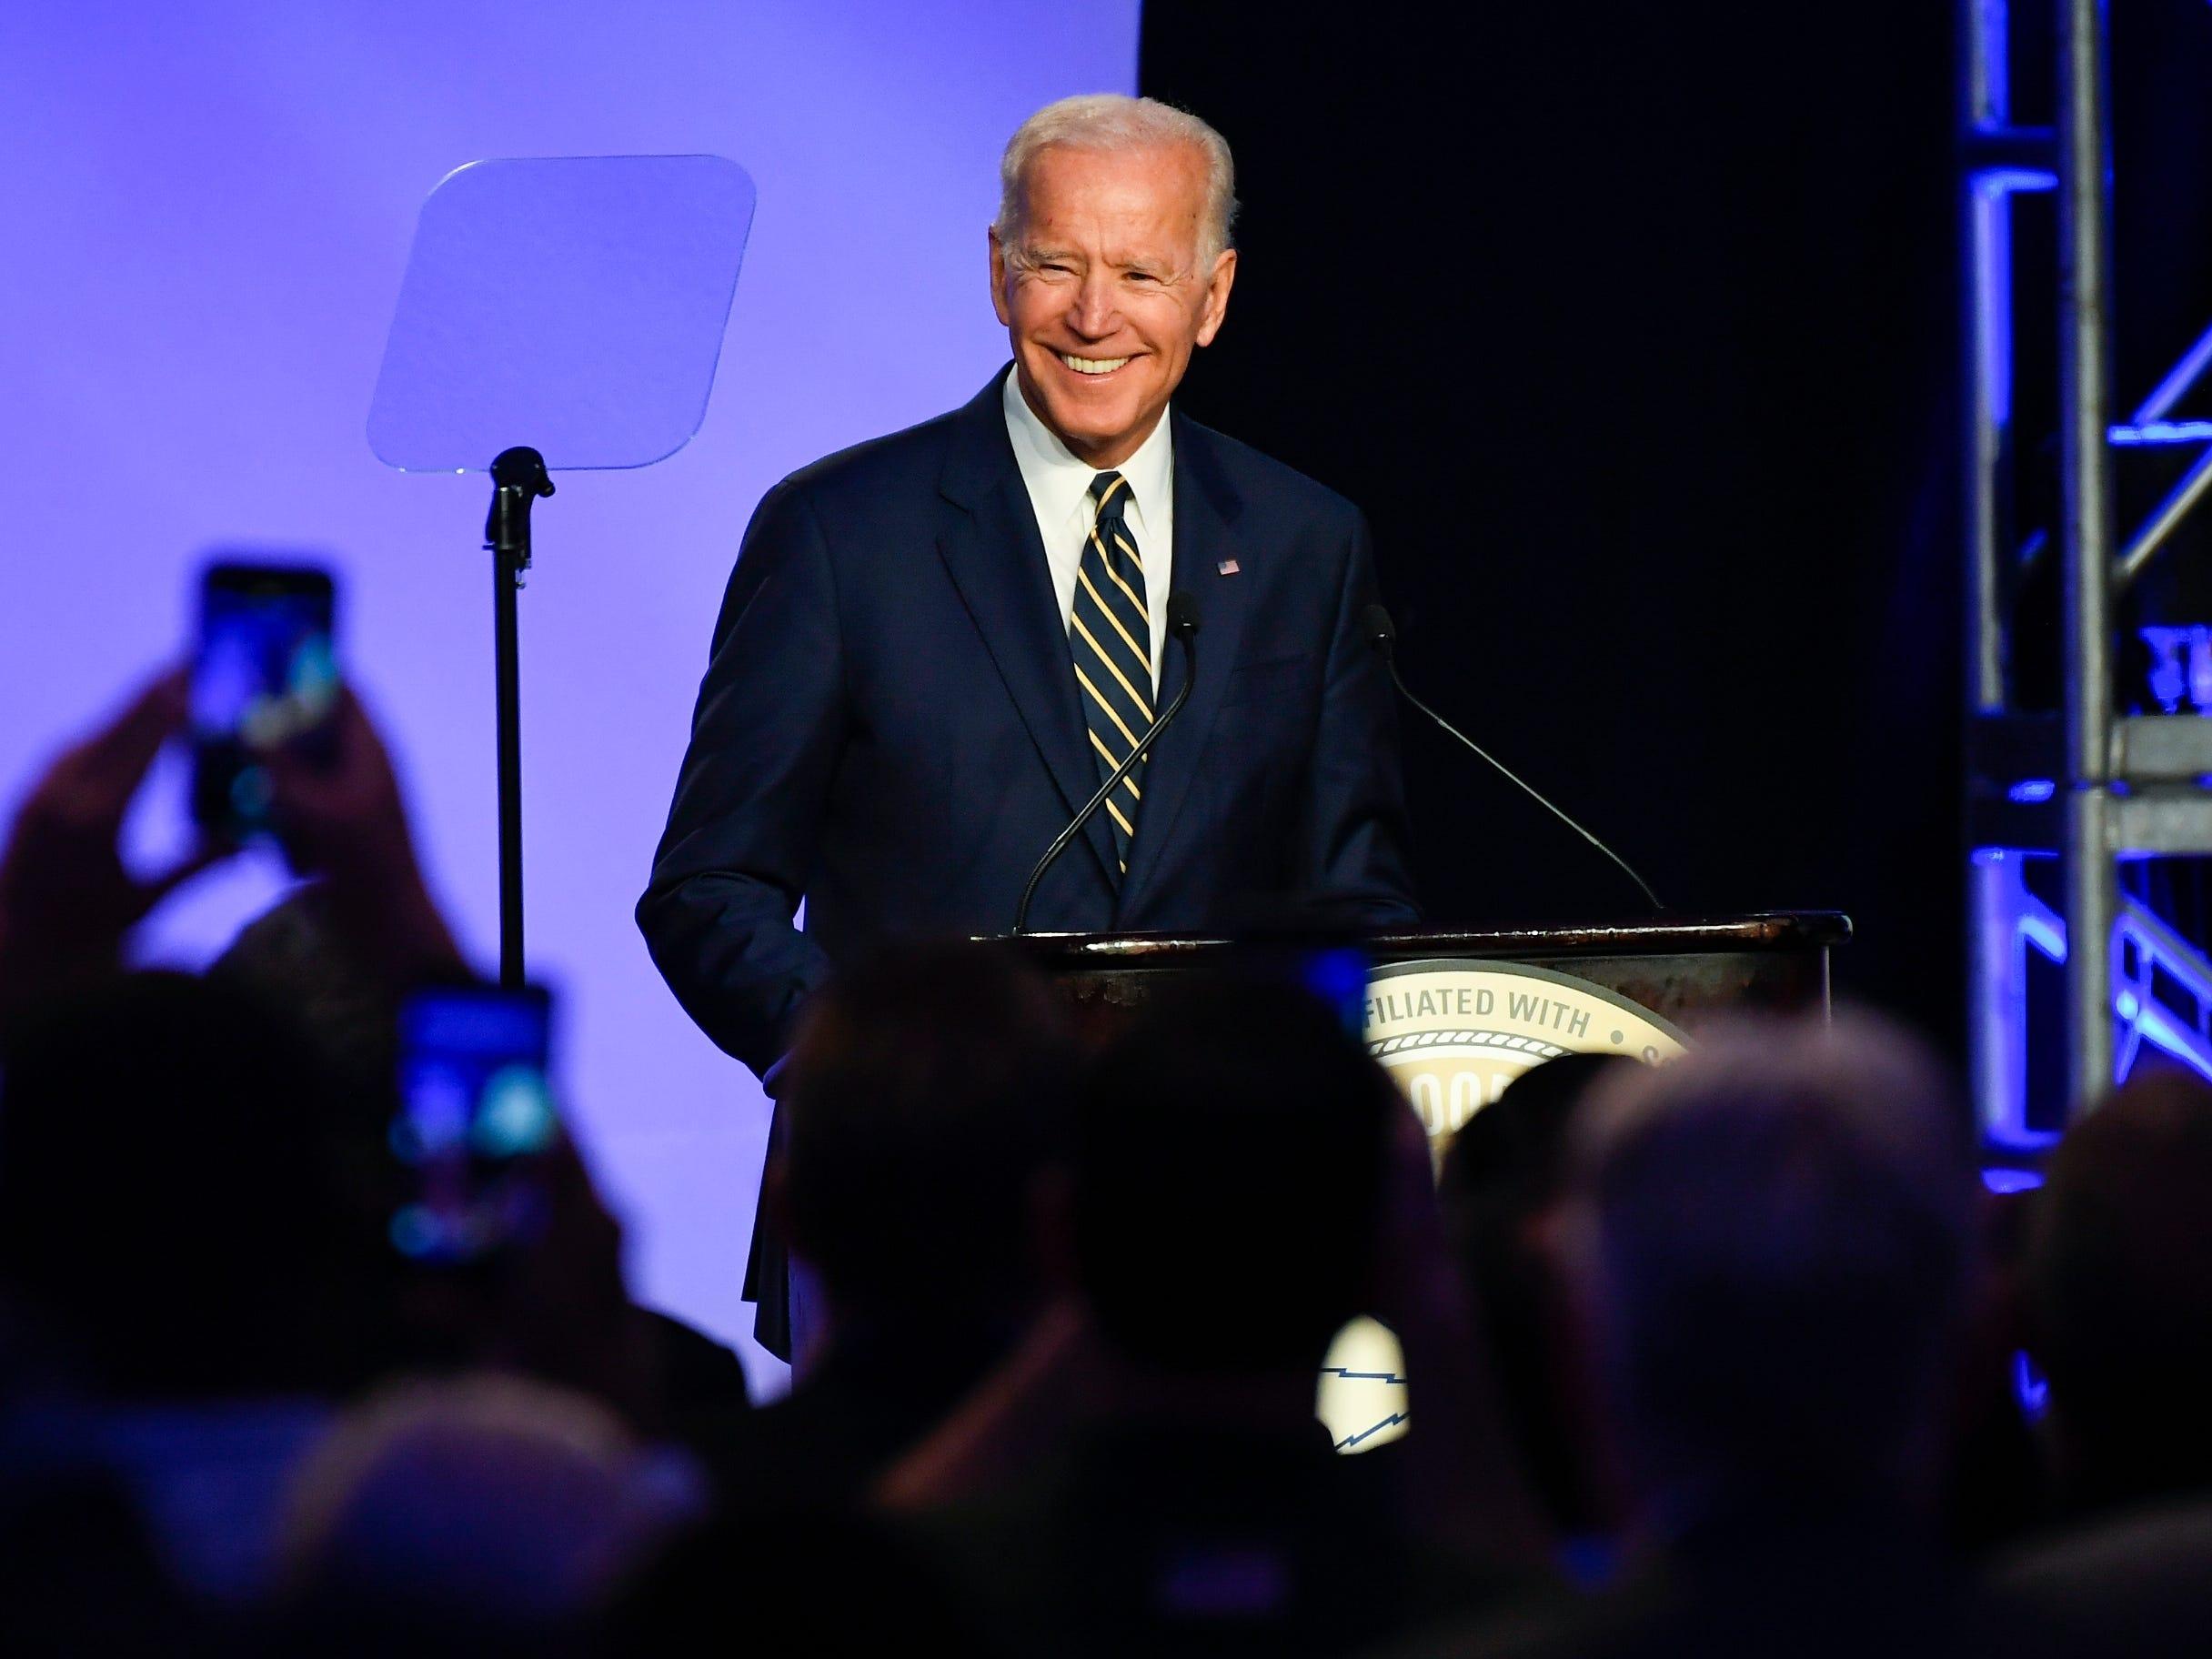 Joe Biden expected to launch 2020 presidential campaign Thursday